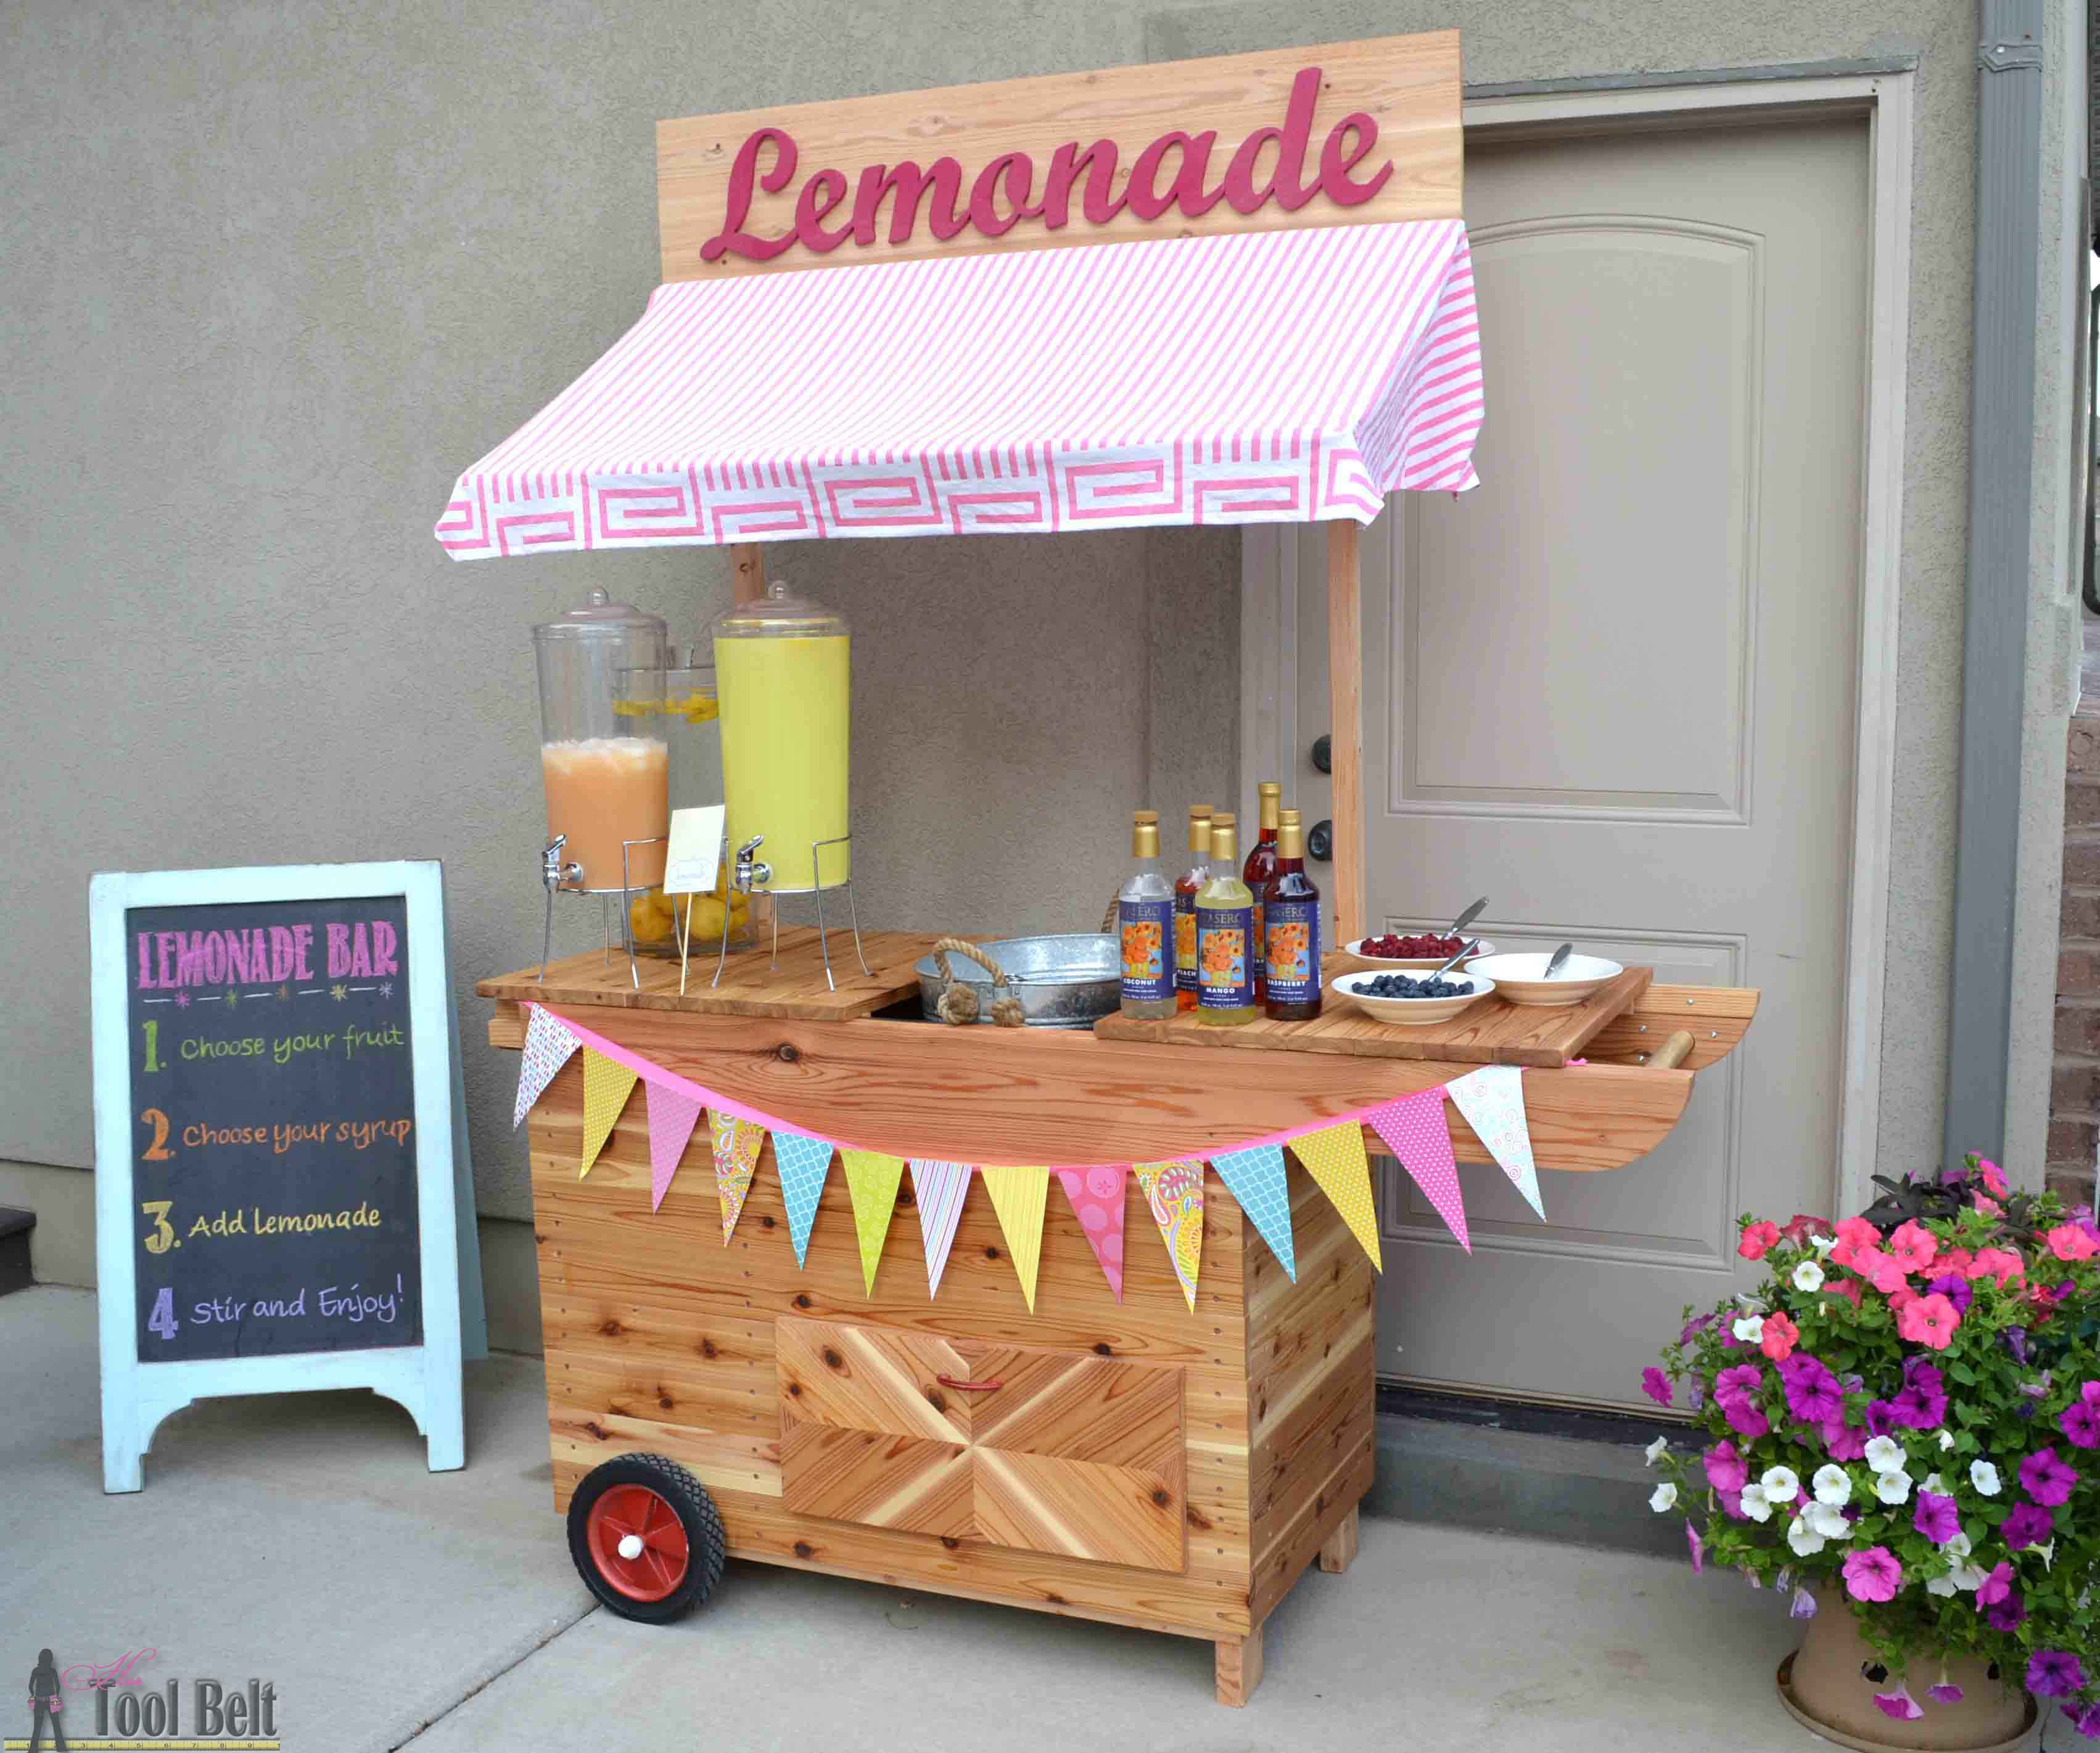 Diy Lemonade Stand With Wheels Her Tool Belt